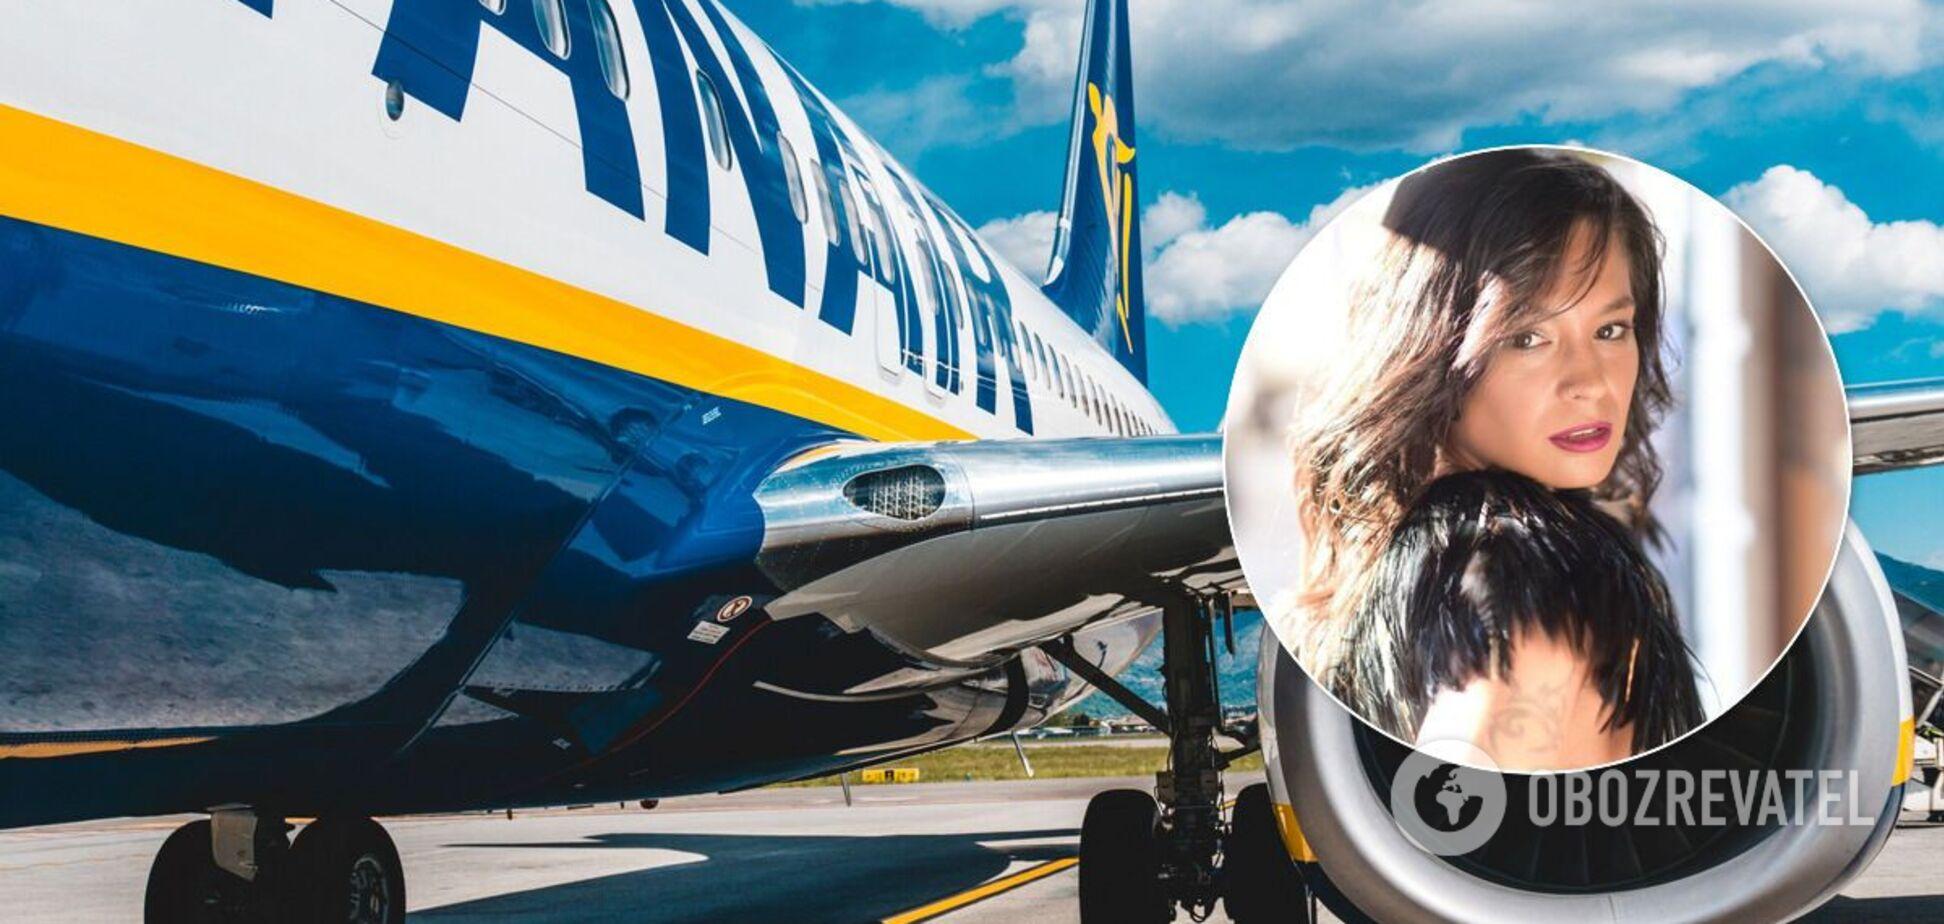 Пассажирка Ryanair вместо Валенсии ошибочно прилетела в Киев